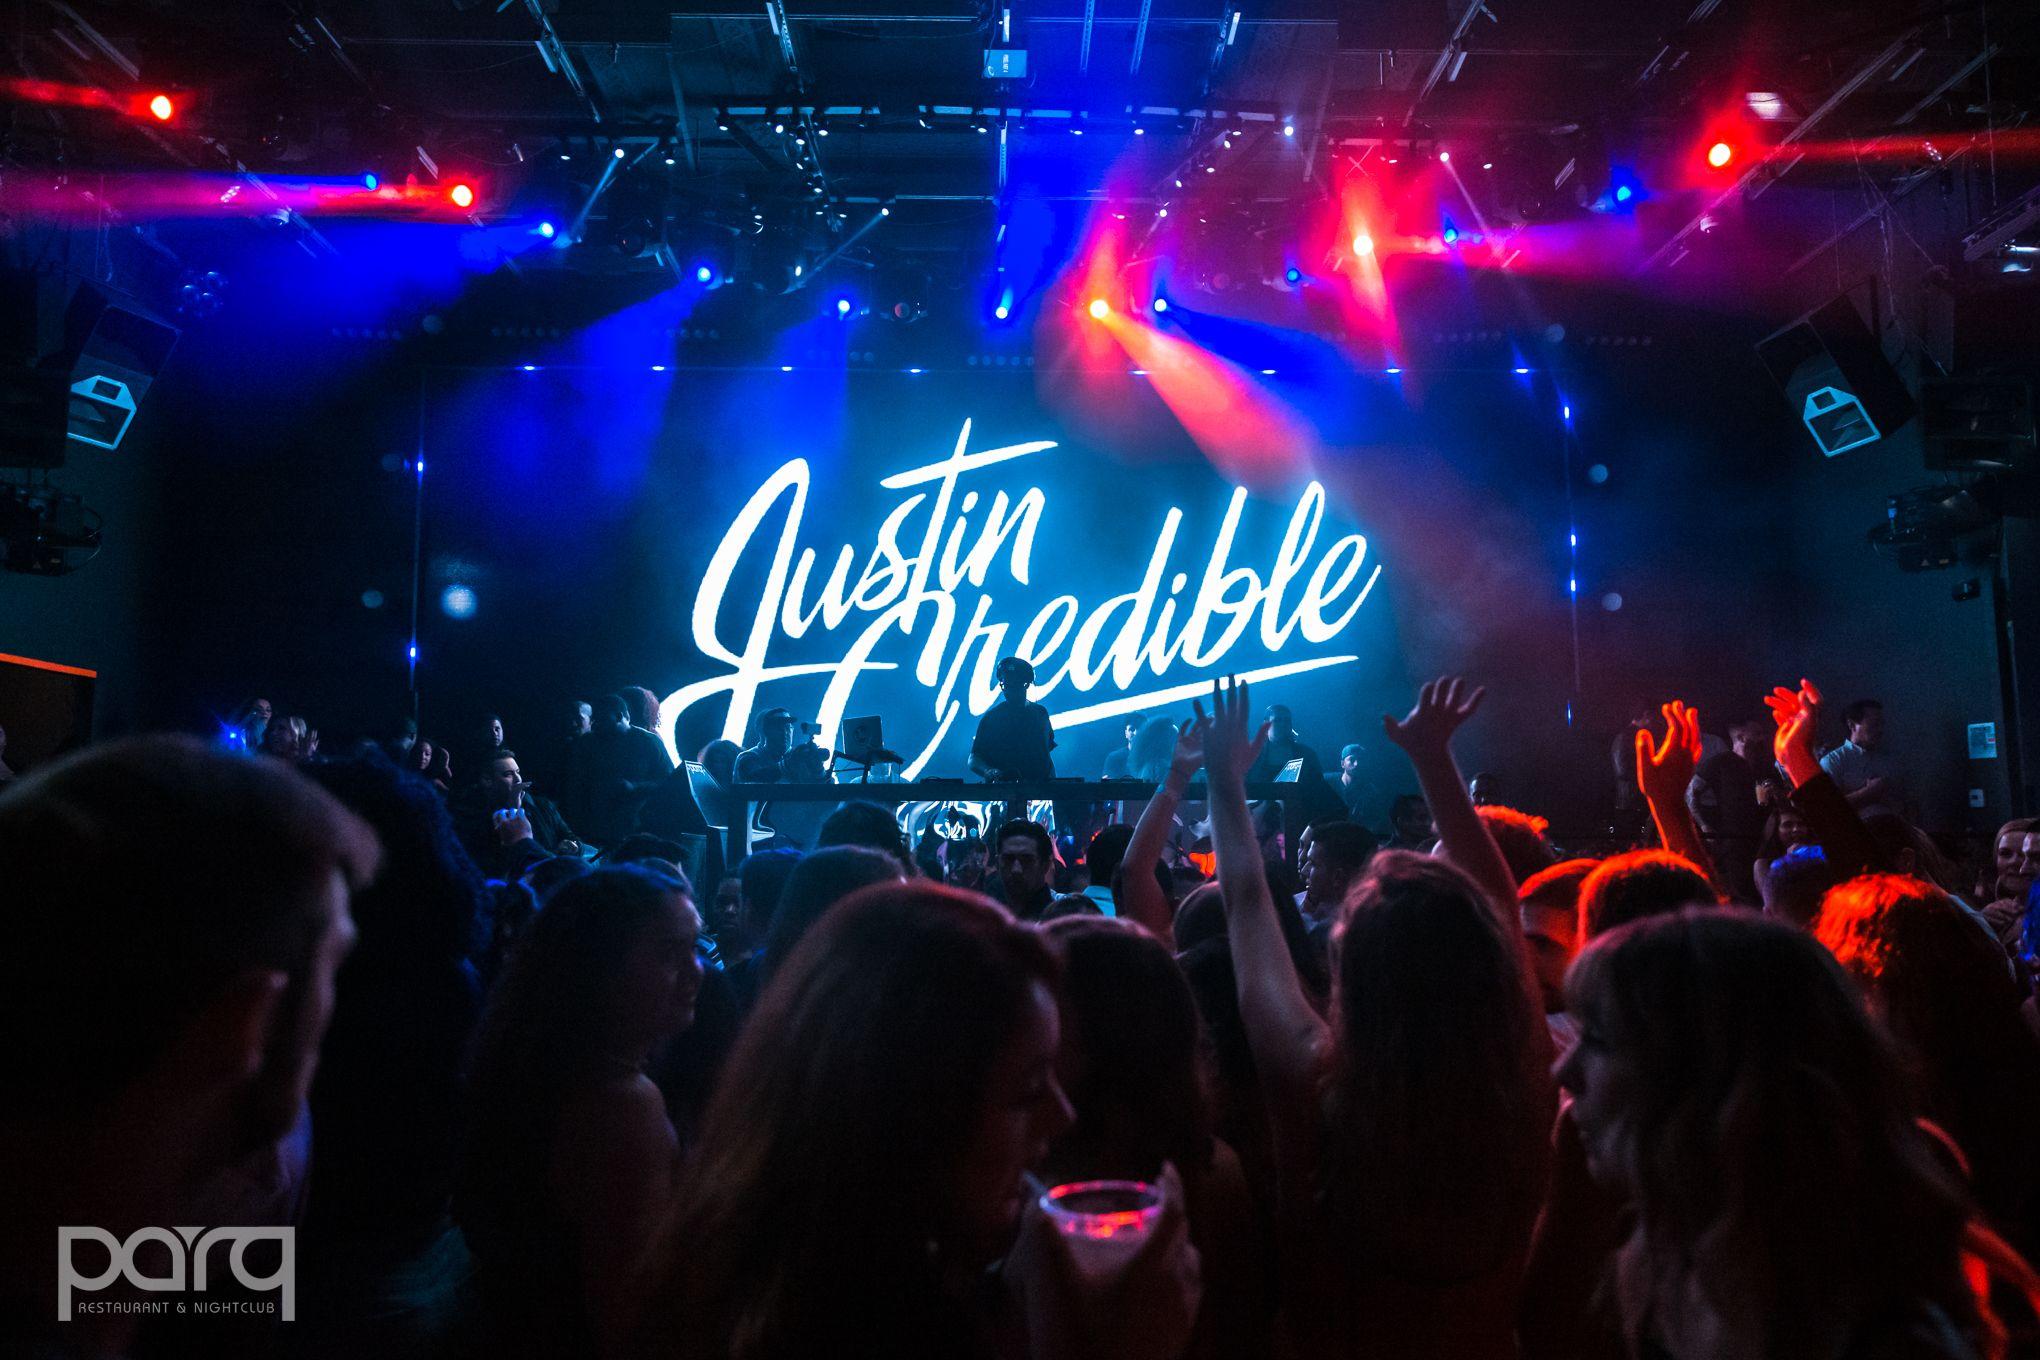 09.28.19 Parq - Justin Credible-8.jpg